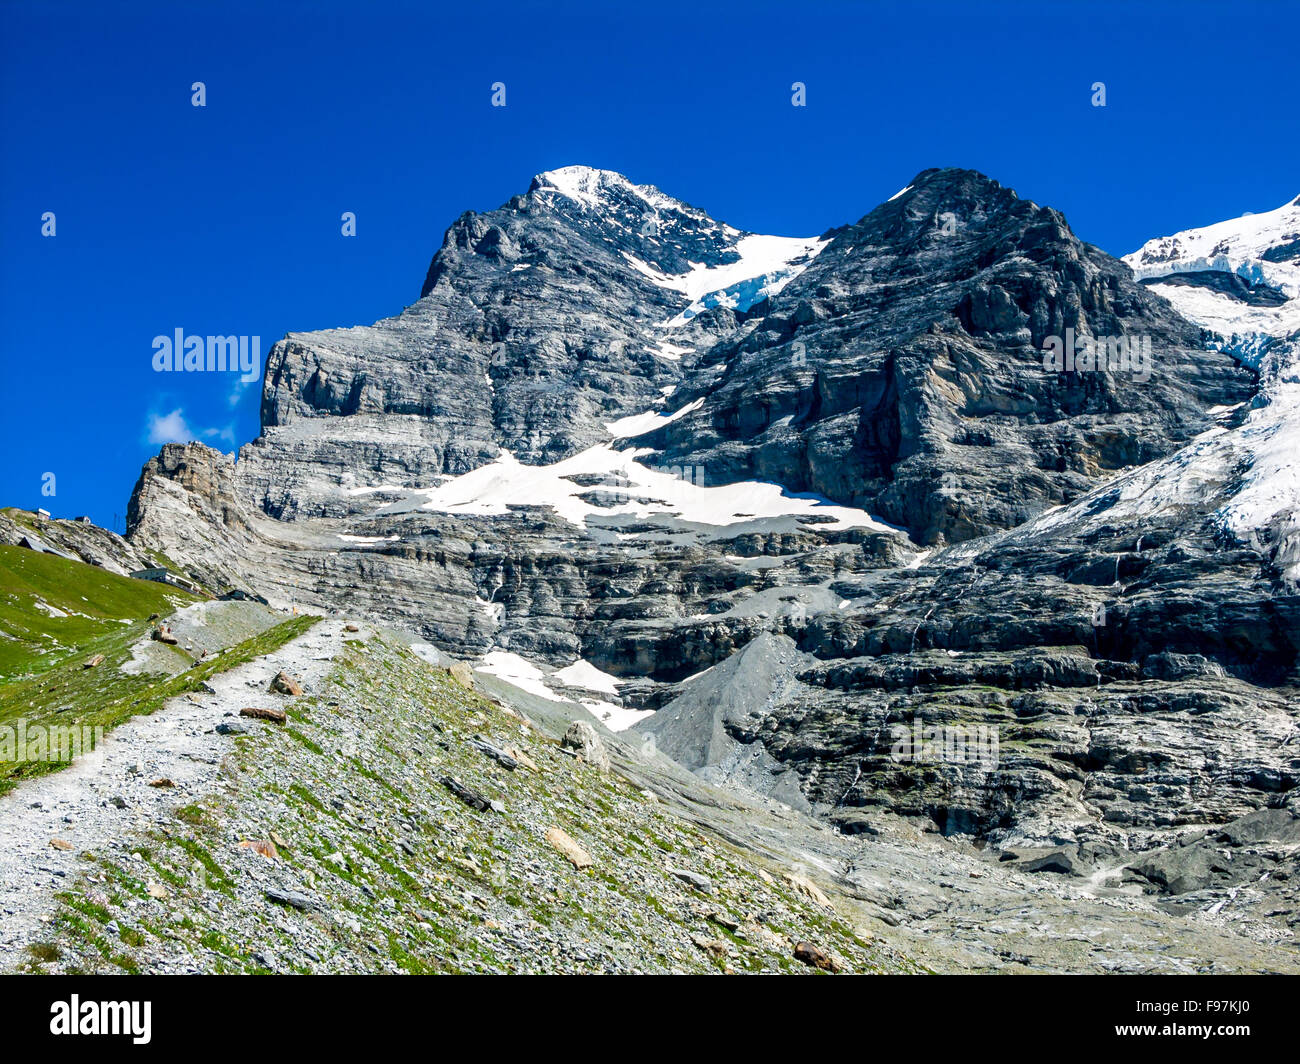 Eiger, Switzerland. One of amazing mountain peaks in Berner Oberland part of European Alps, main landmark of Swiss - Stock Image